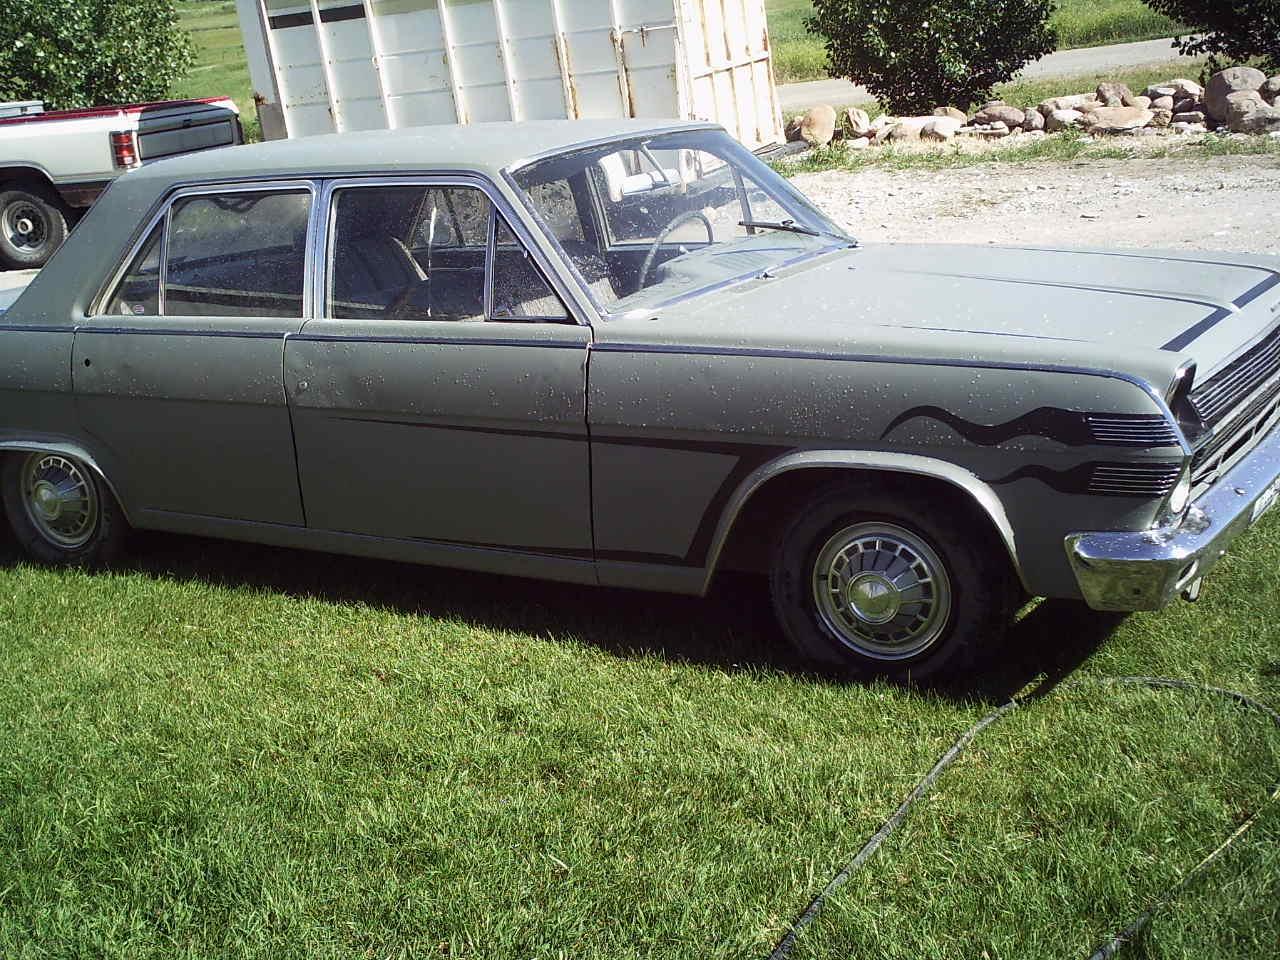 Click image for larger version  Name:jon's car 002.jpg Views:113 Size:187.7 KB ID:5688